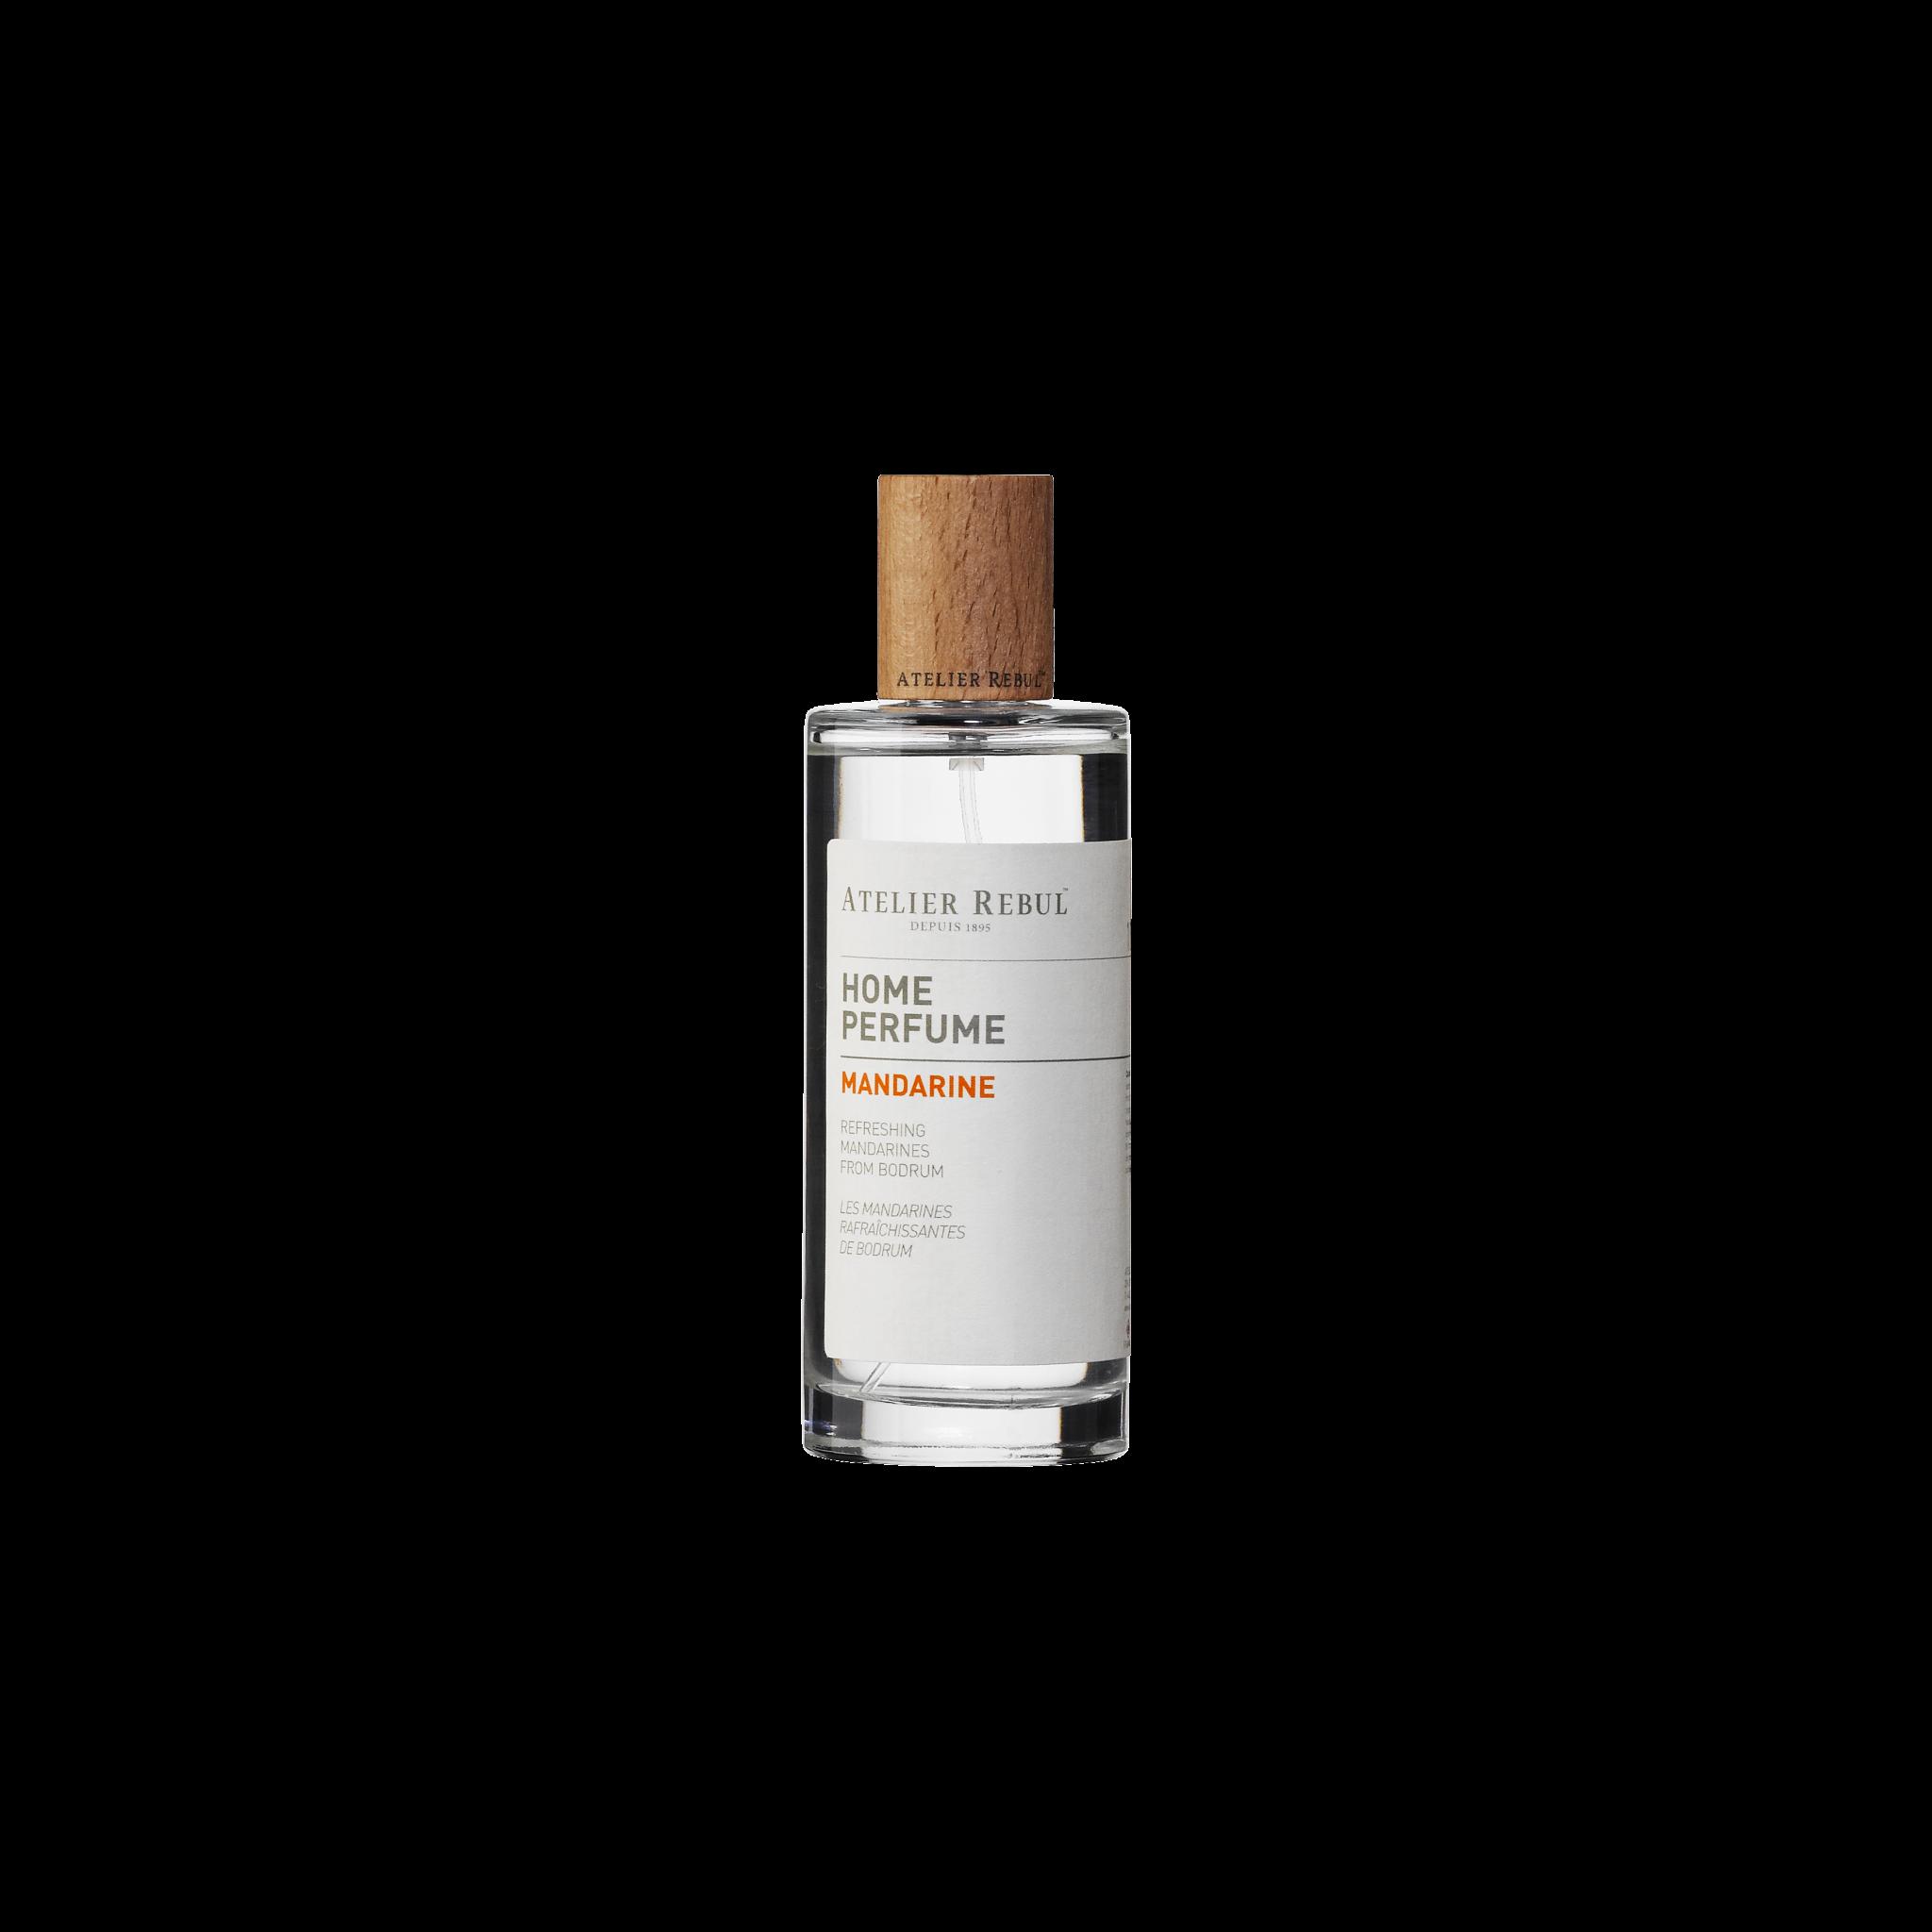 Atelier Rebul Atelier Rebul Home Perfume Mandarine 100ml